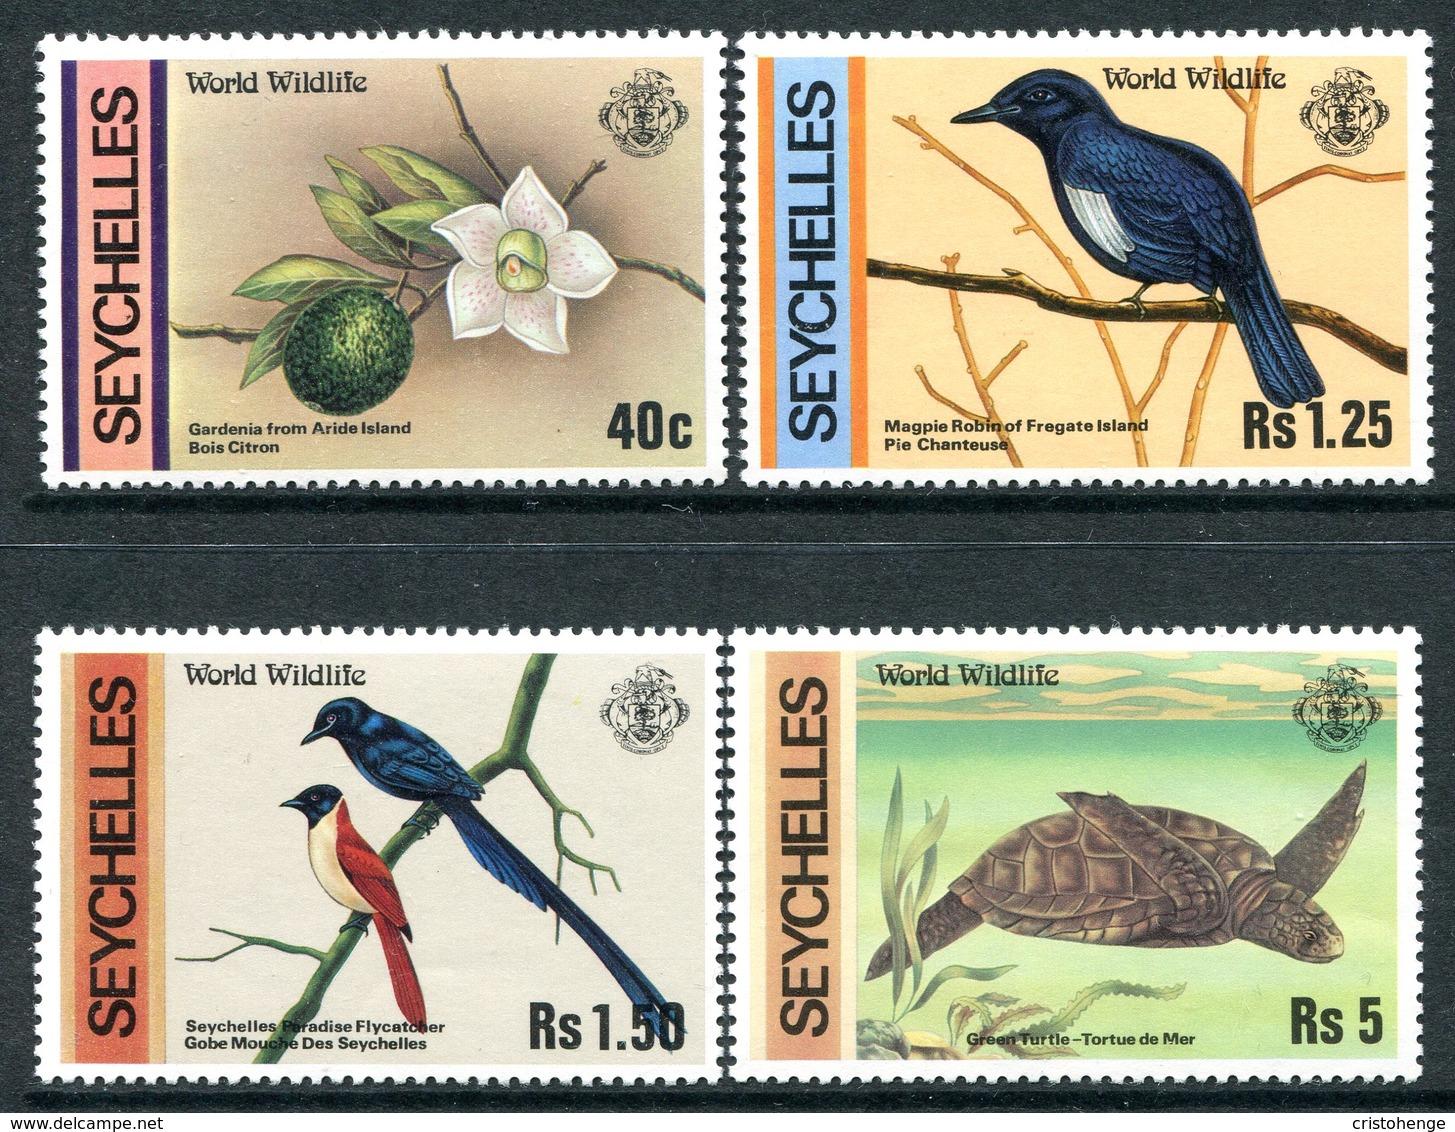 Seychelles 1978 Wildlife Set MNH (SG 433-436) - Seychelles (1976-...)